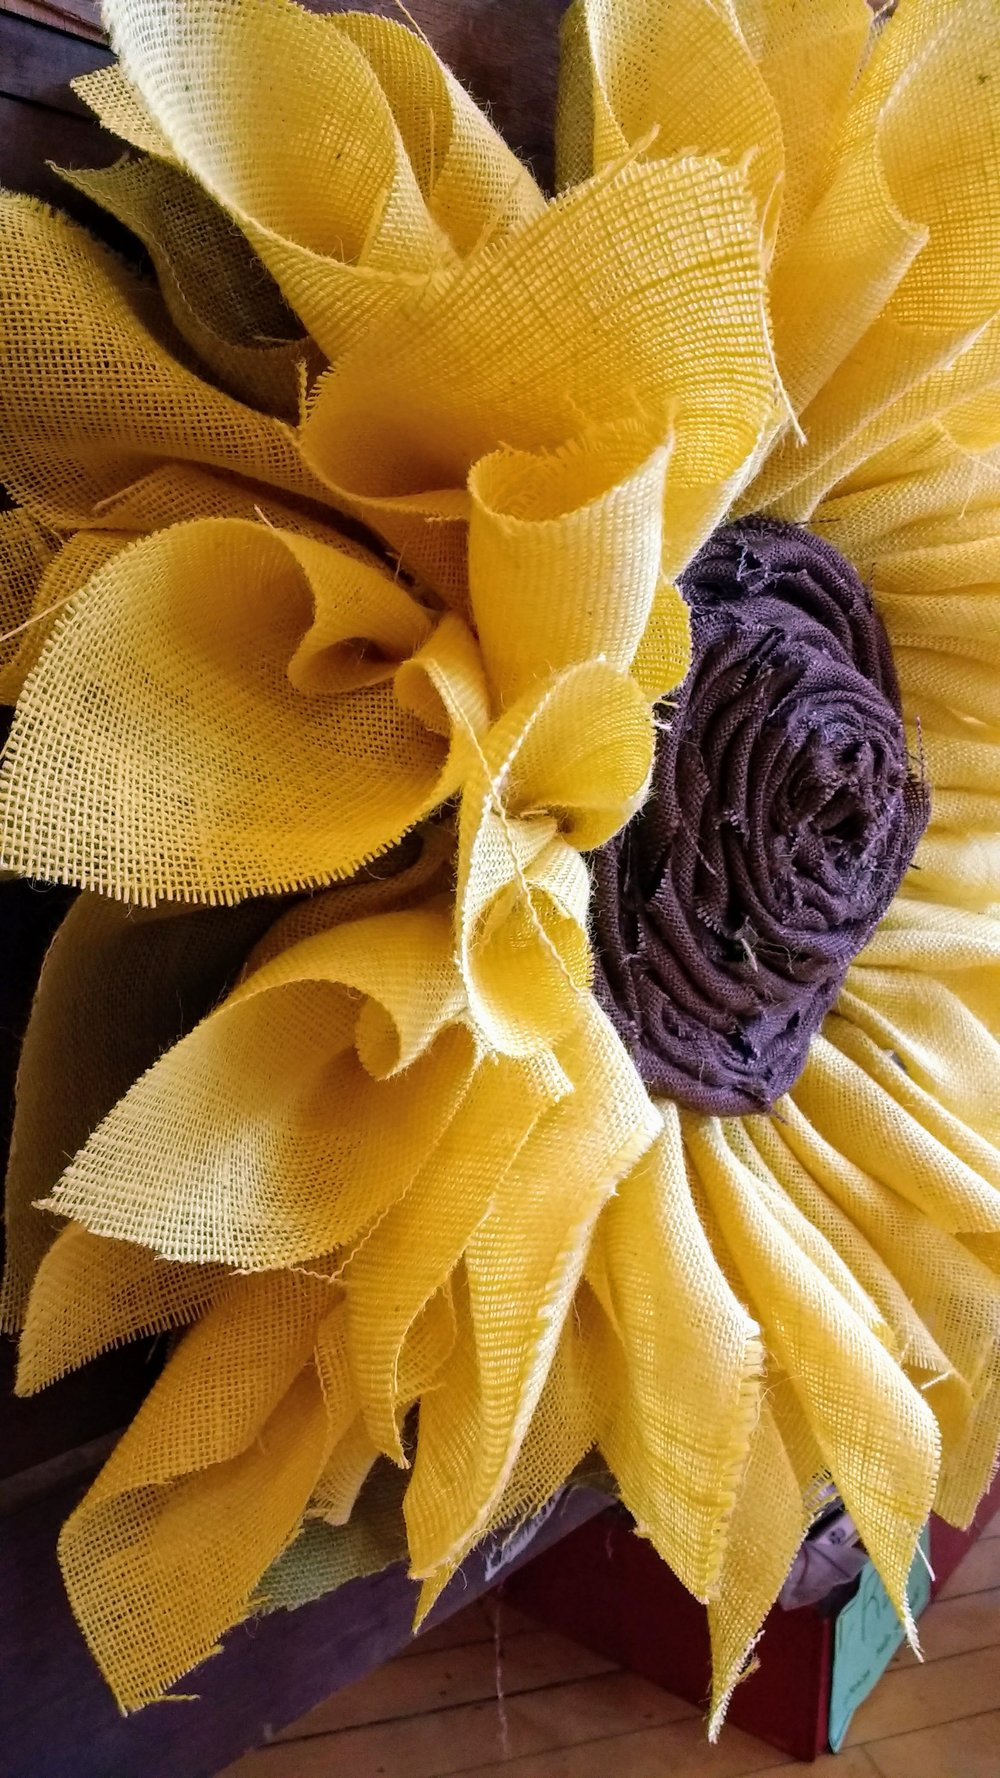 sunflowerwreath2.jpg